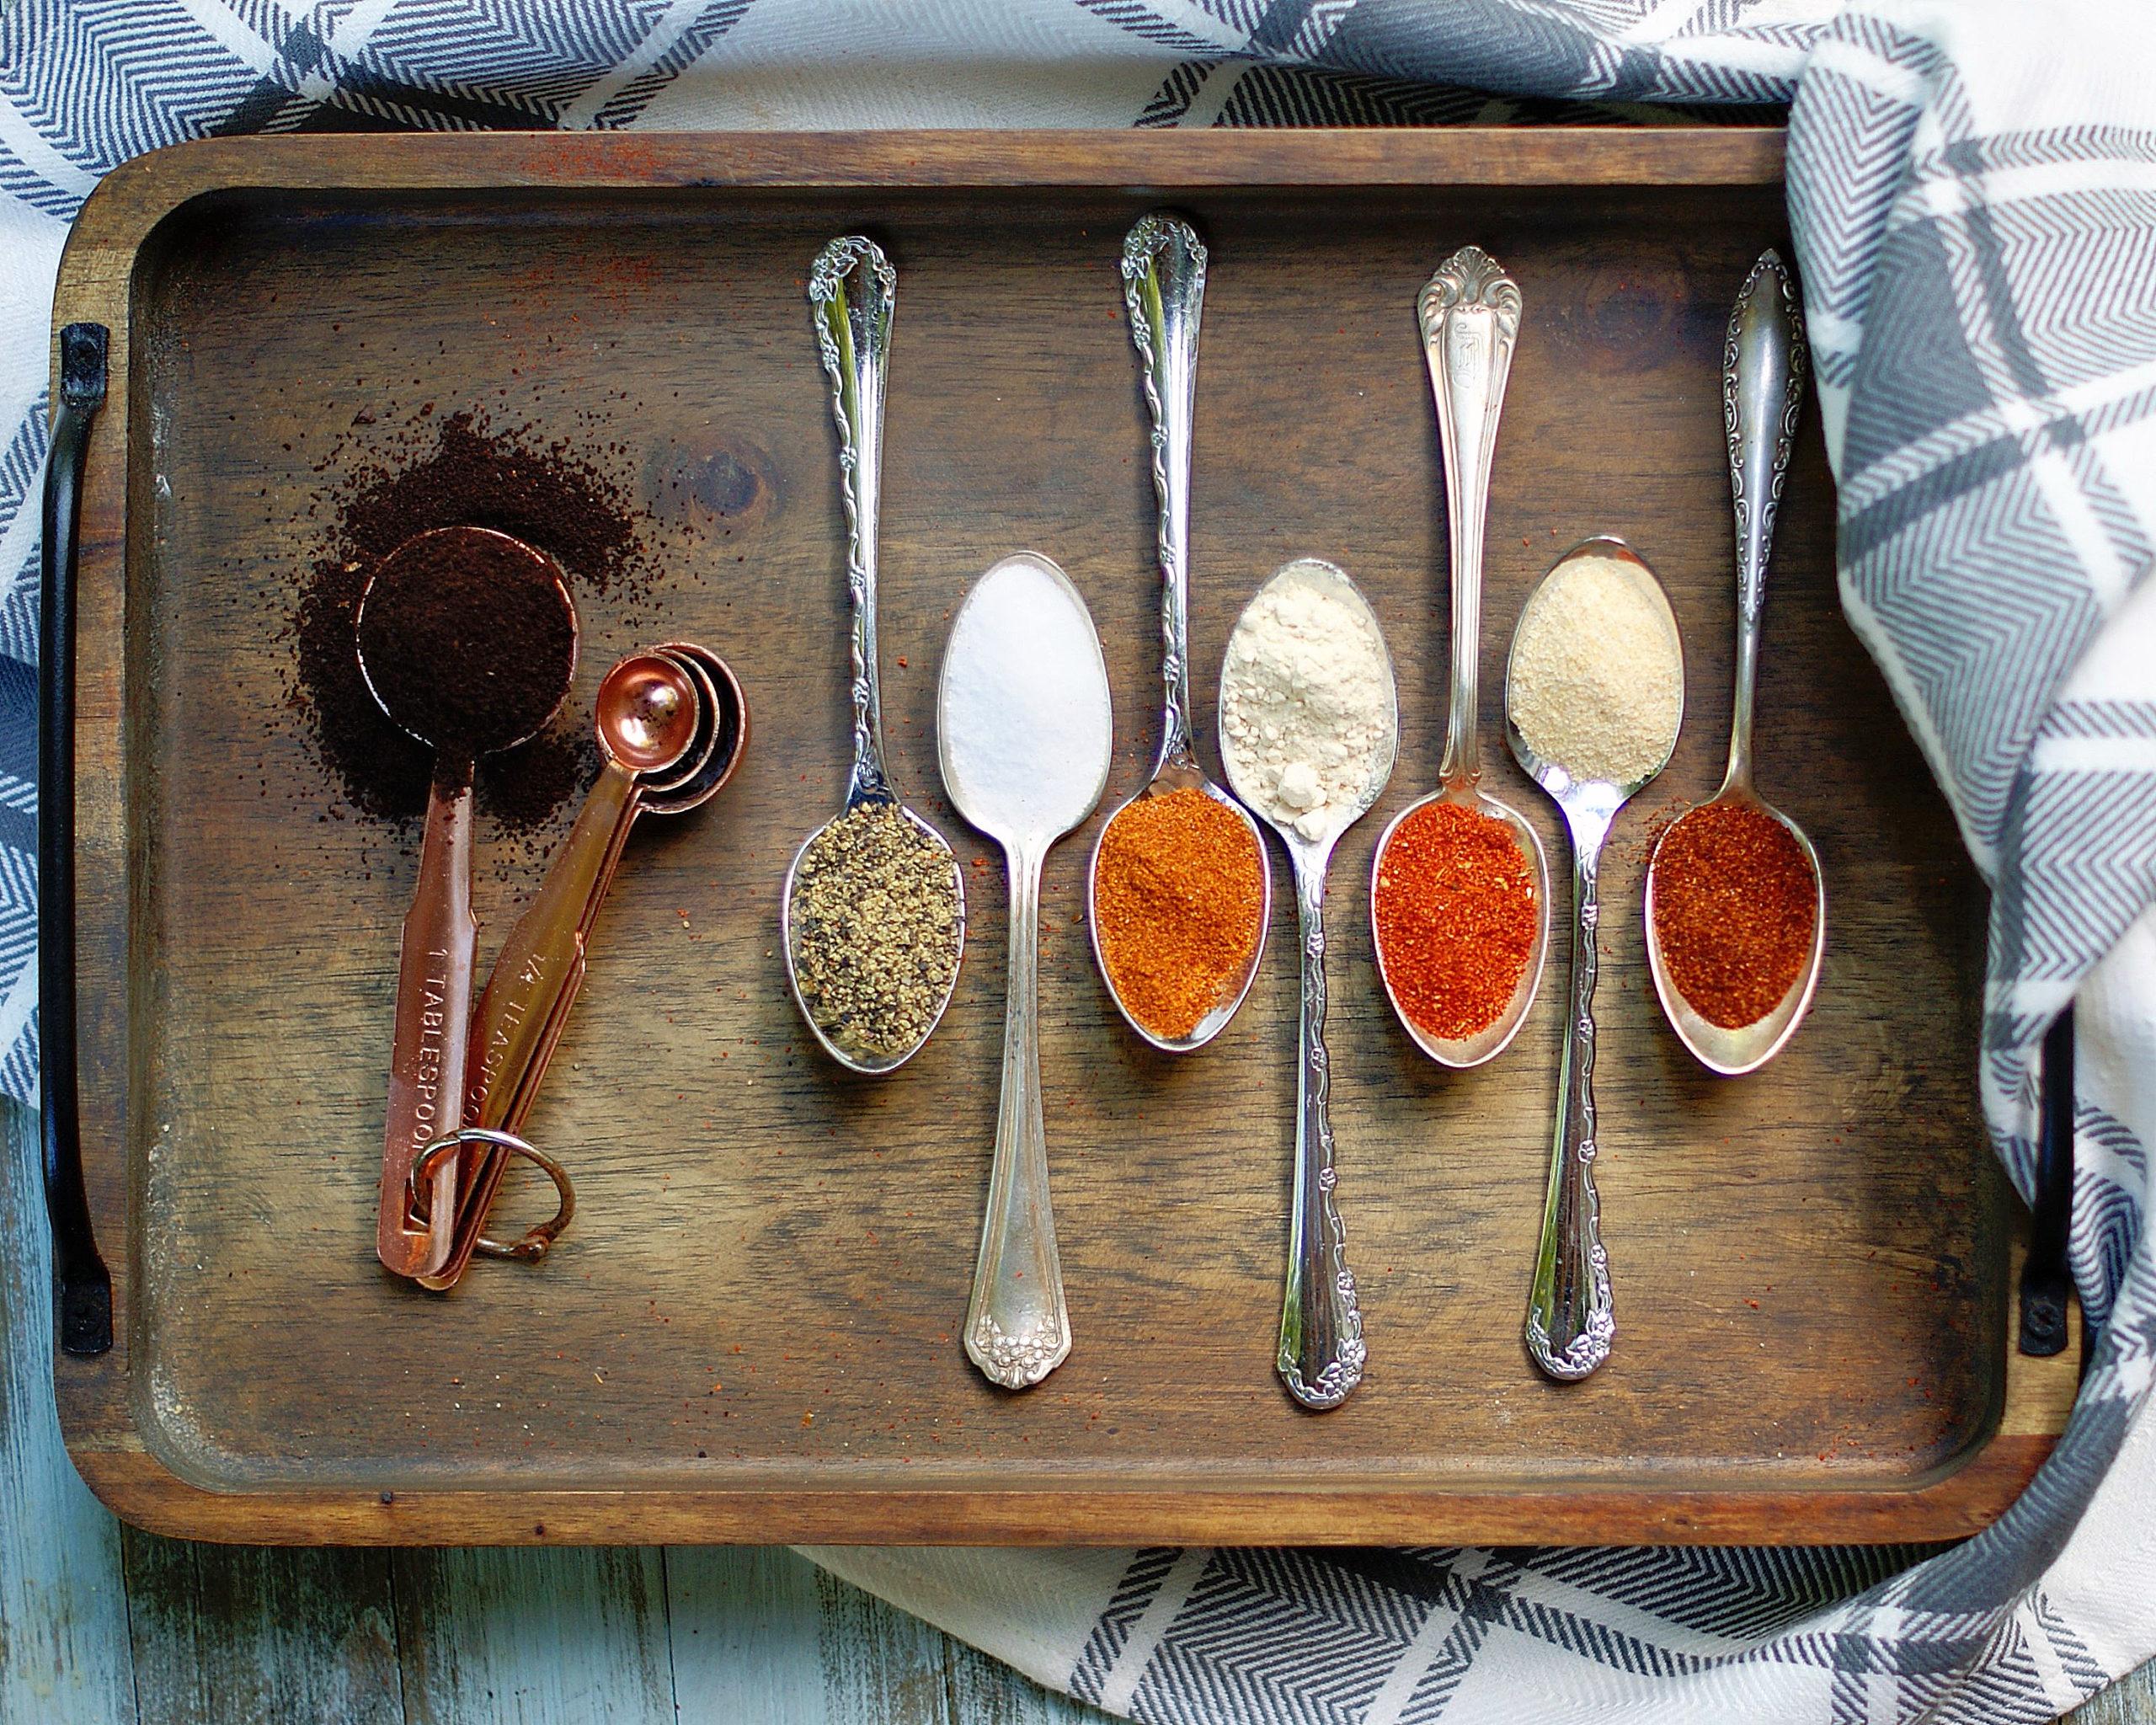 Smoky Sweet Coffee Rub Ingredients